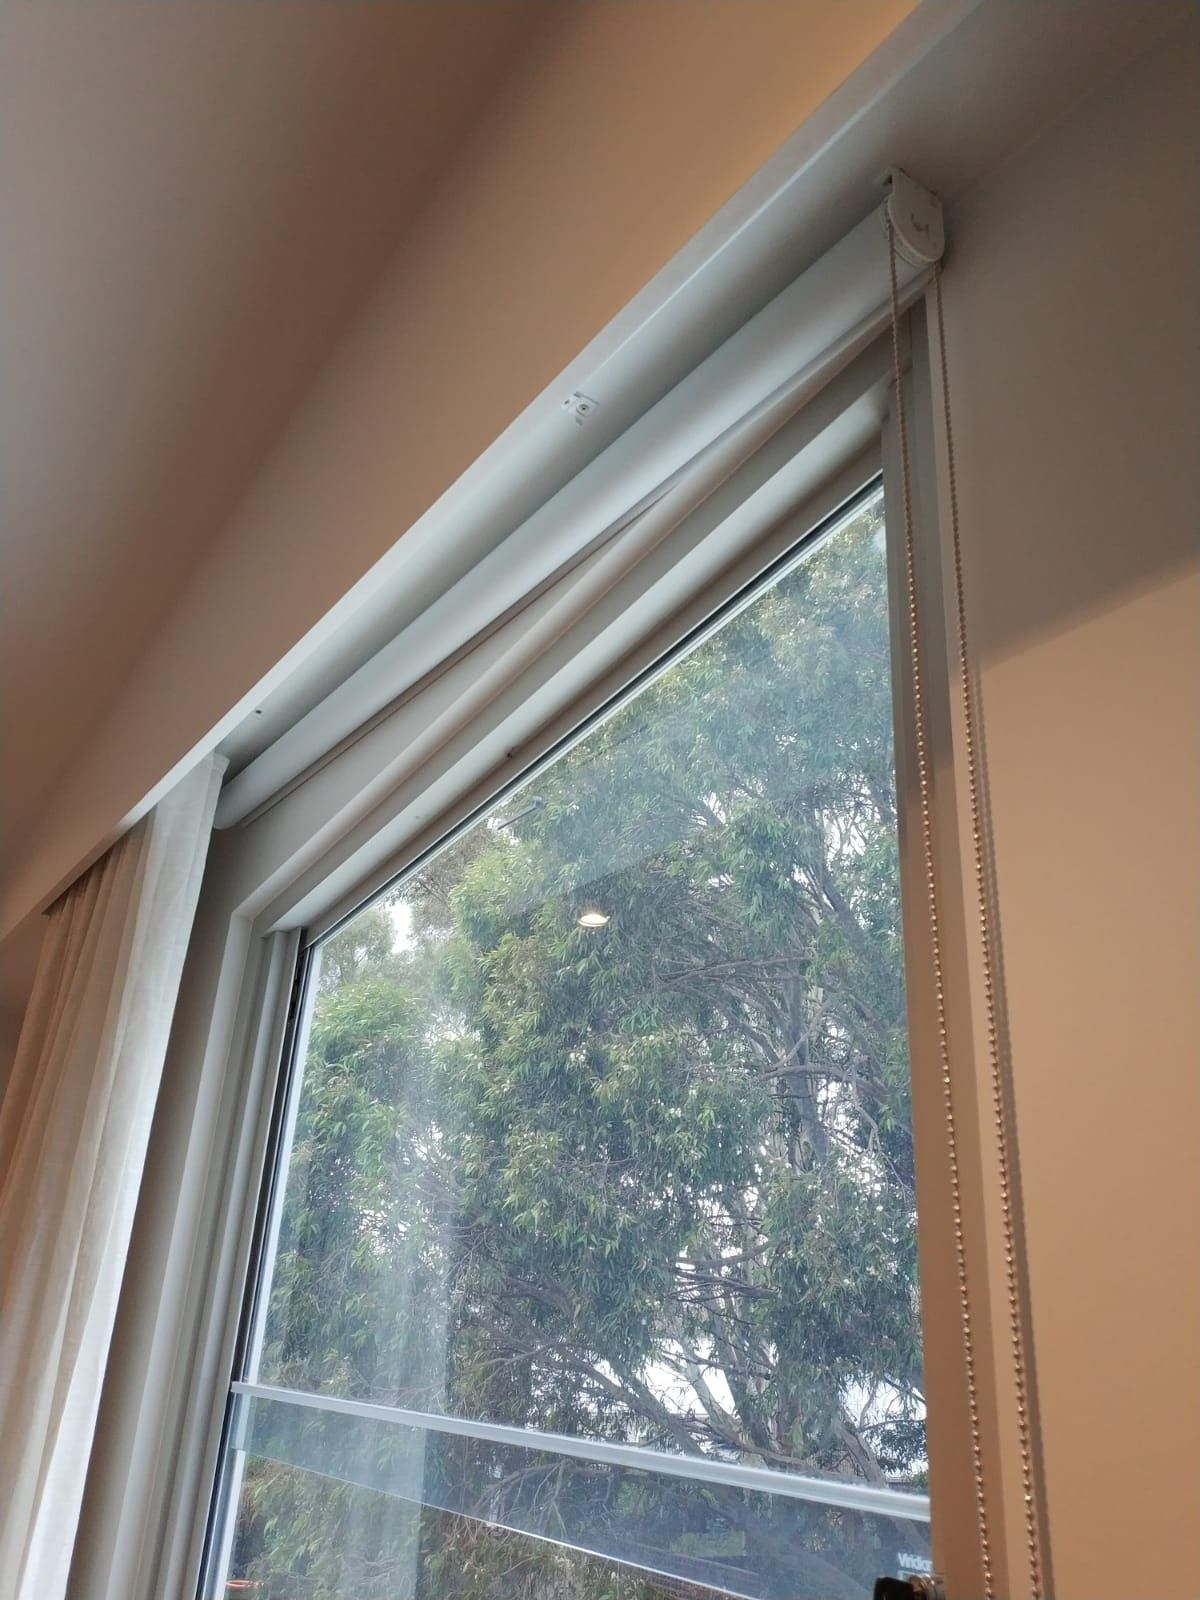 Eyebrow window coverings  pin by katherine mack on furnishing angled windows  pinterest  window